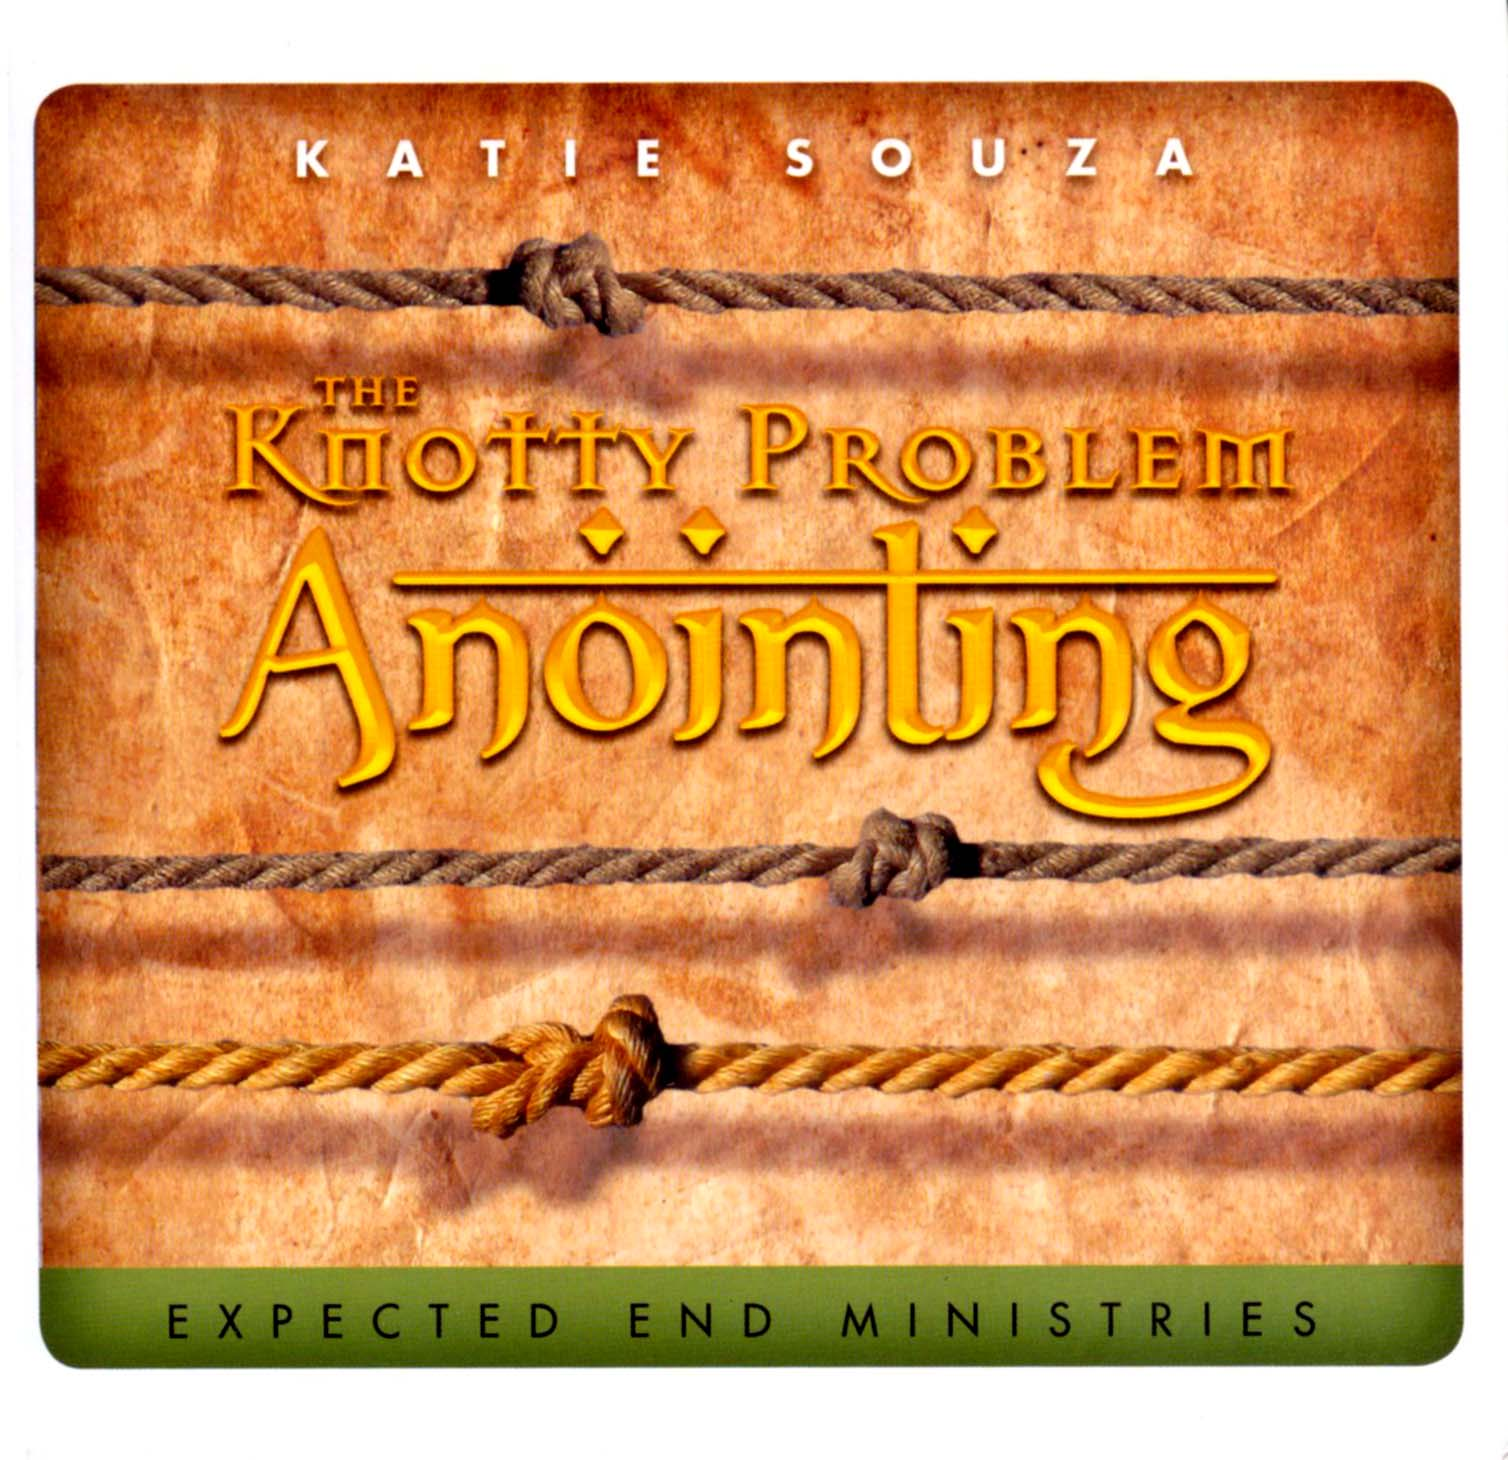 Katie Souza: The Knotty Problem